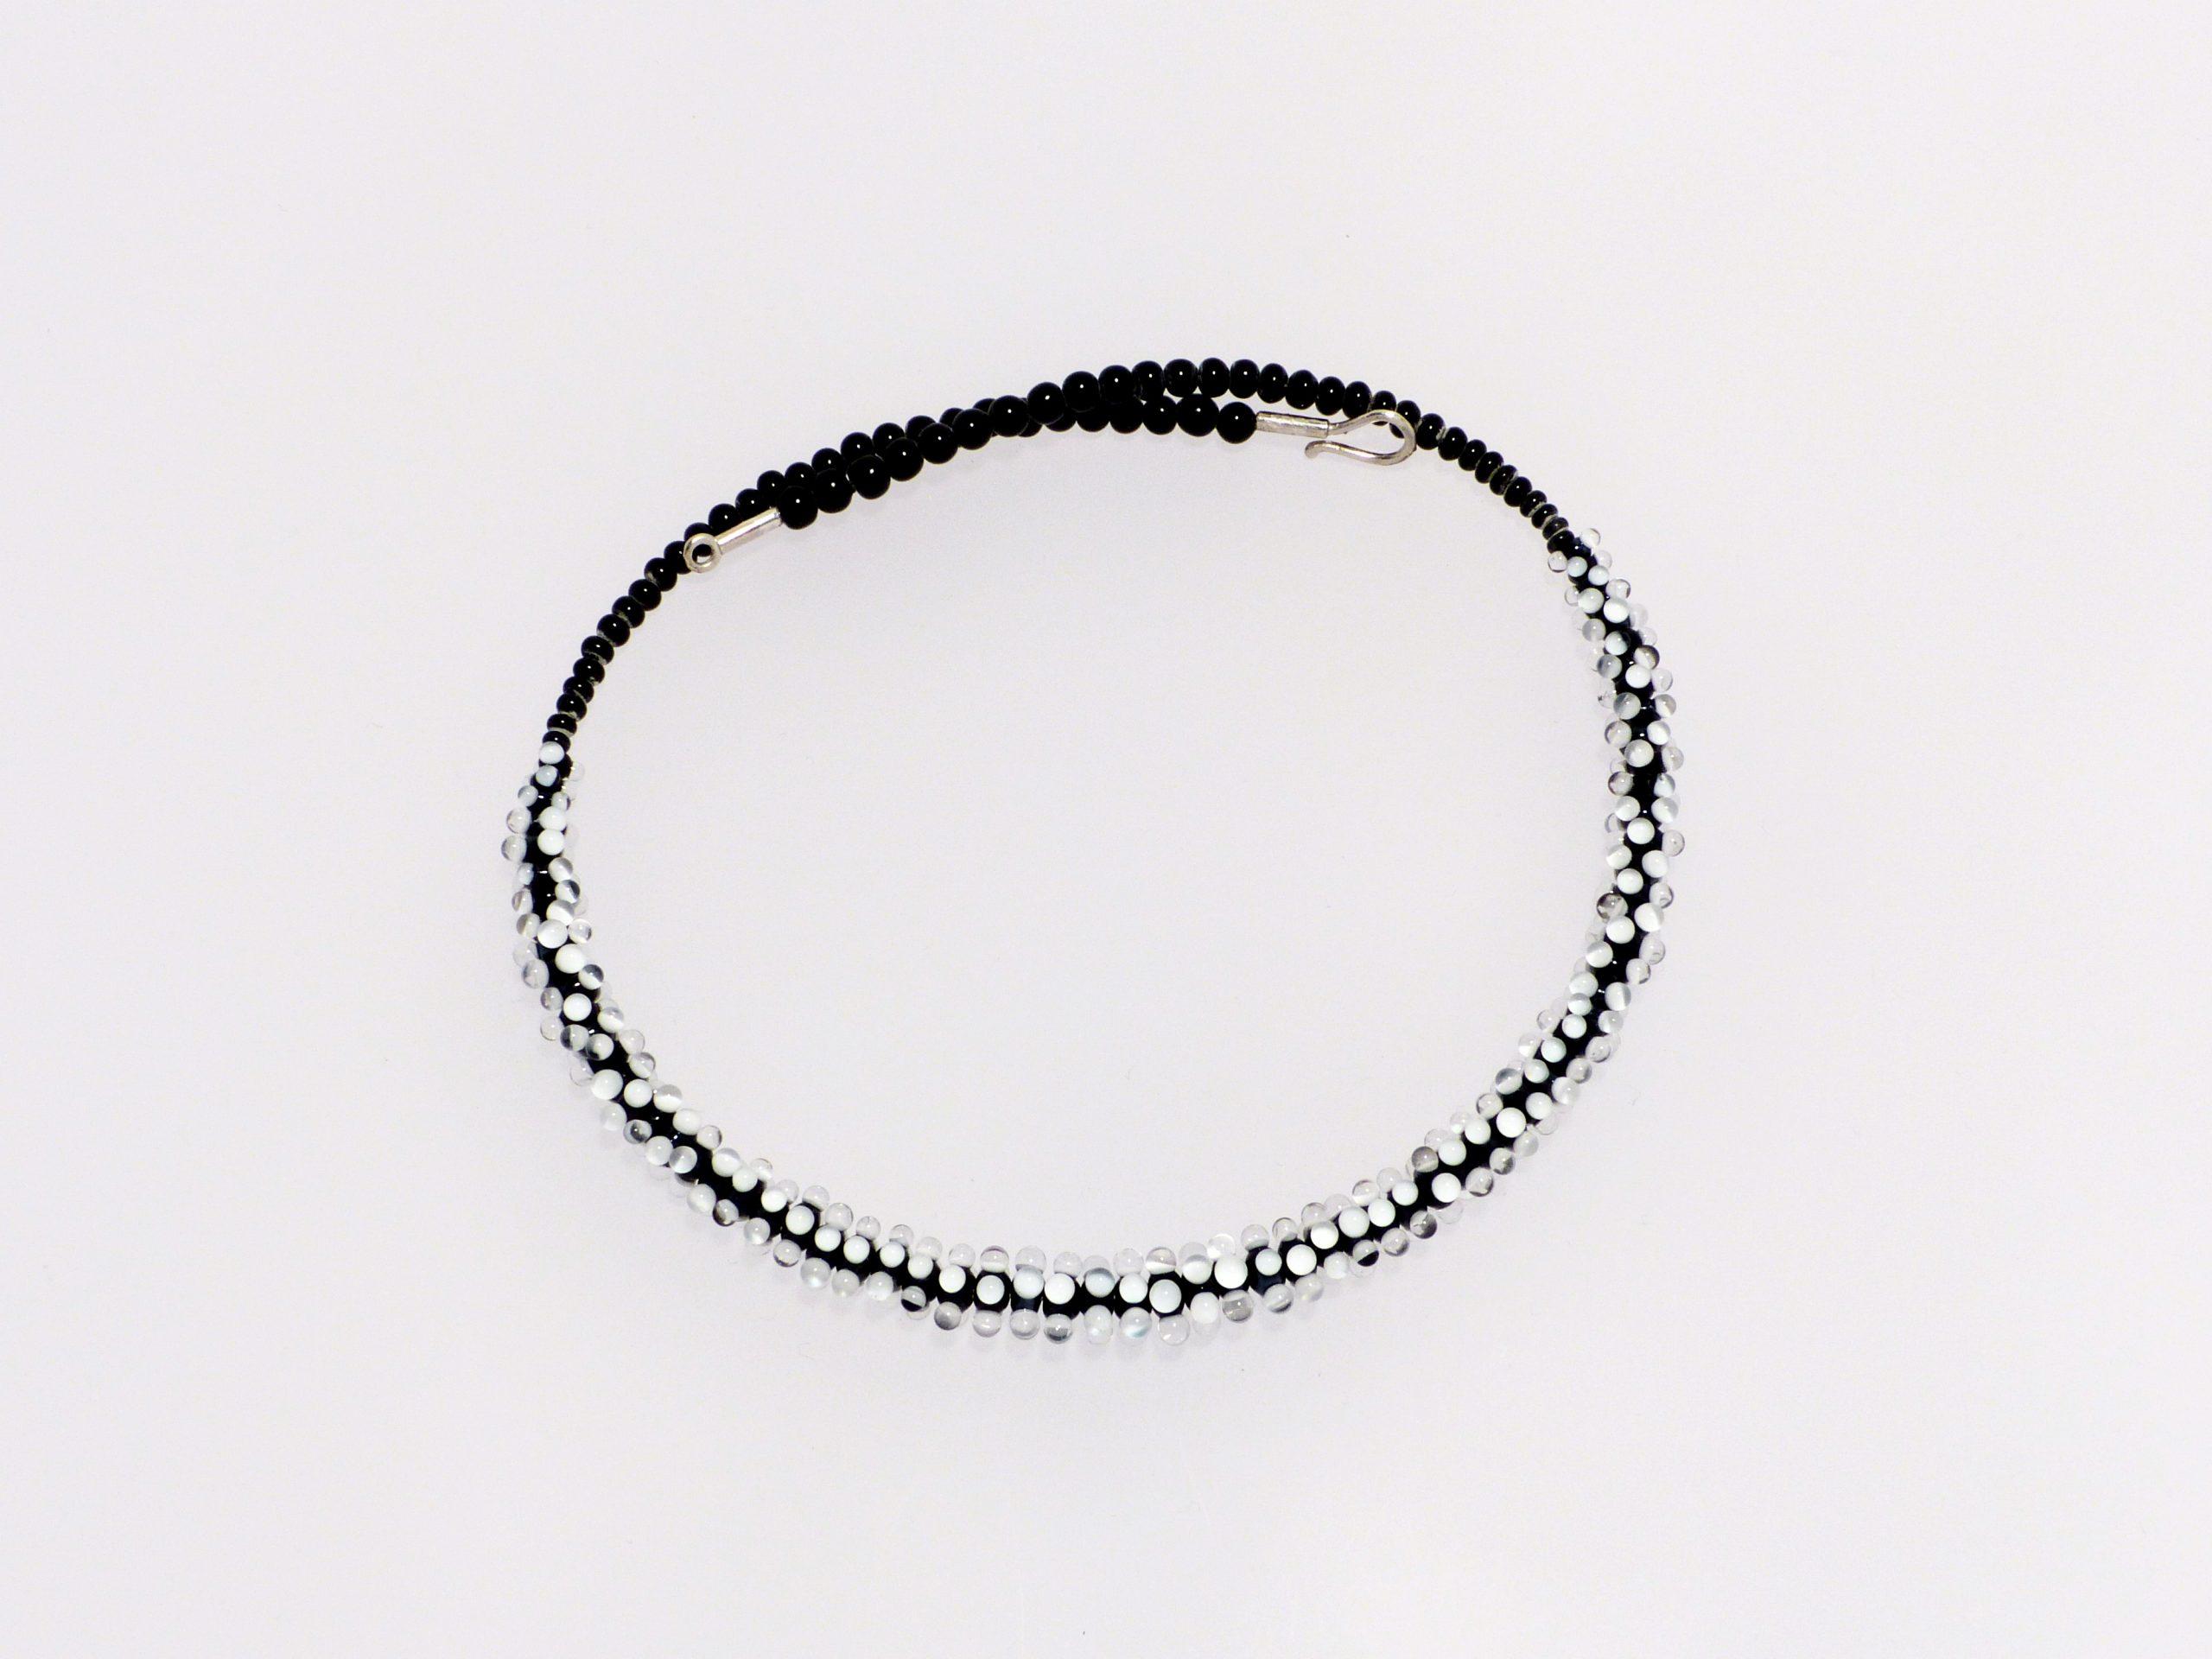 Glanz kompakt, vorne | 3 farbig, Glas, Stahlseil, Silber | 120996-19